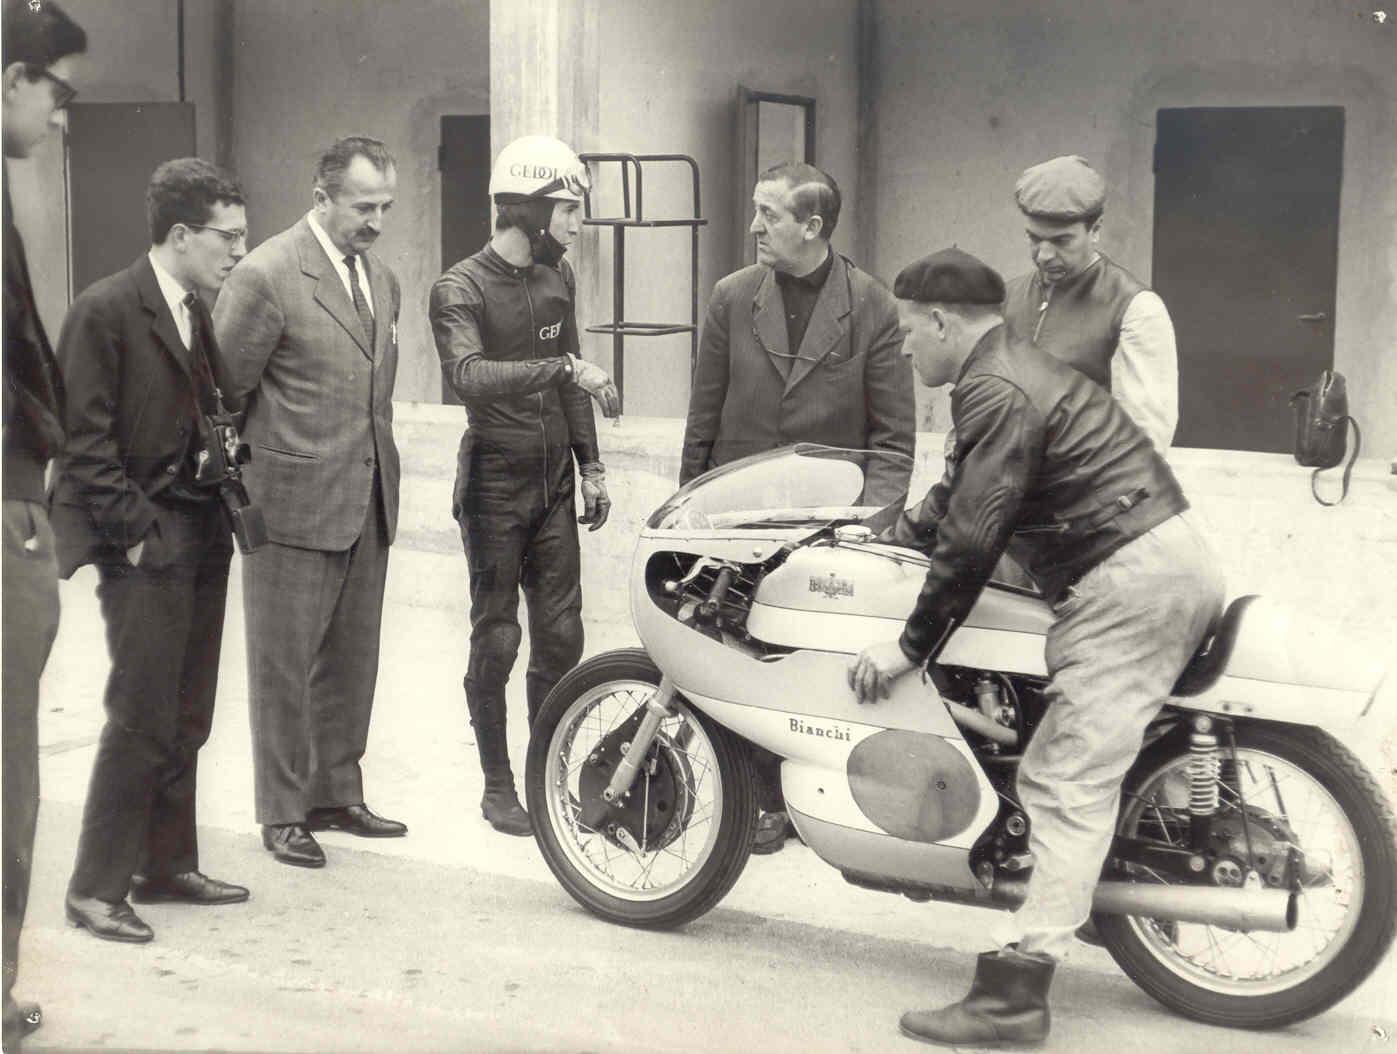 Bianchi moto